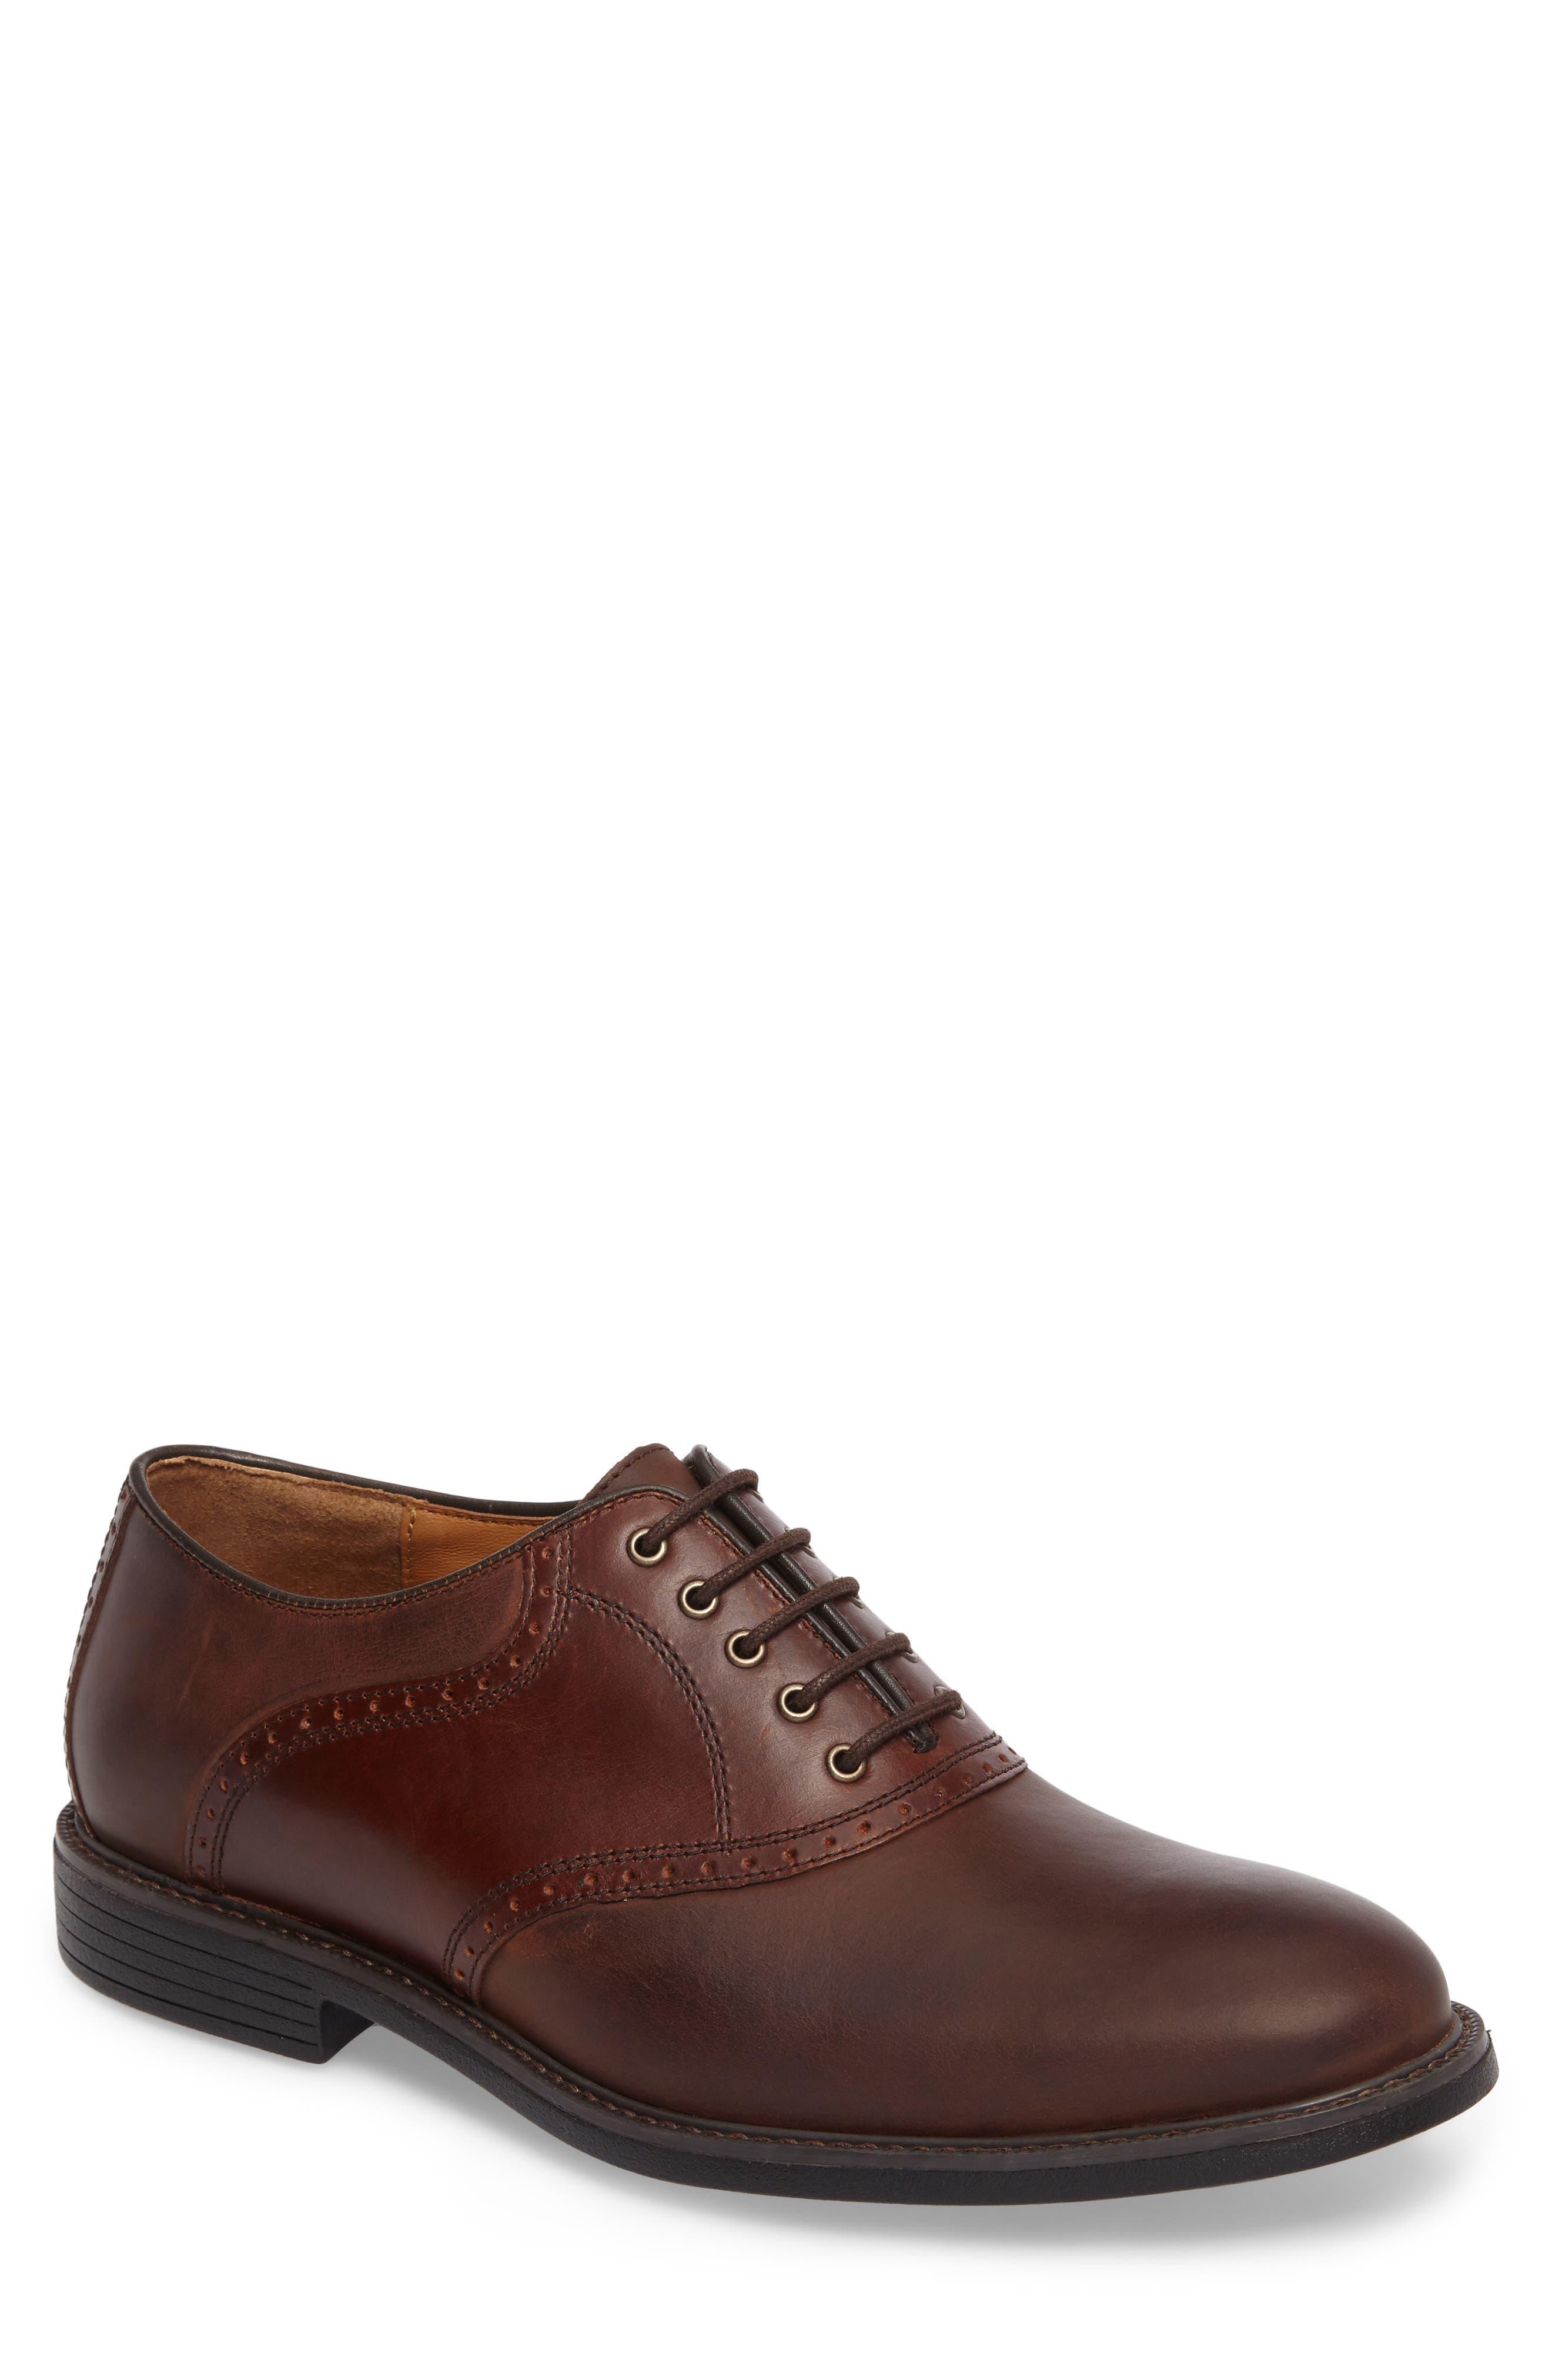 Hollis Waterproof Plain Toe Oxford,                             Main thumbnail 1, color,                             Brown